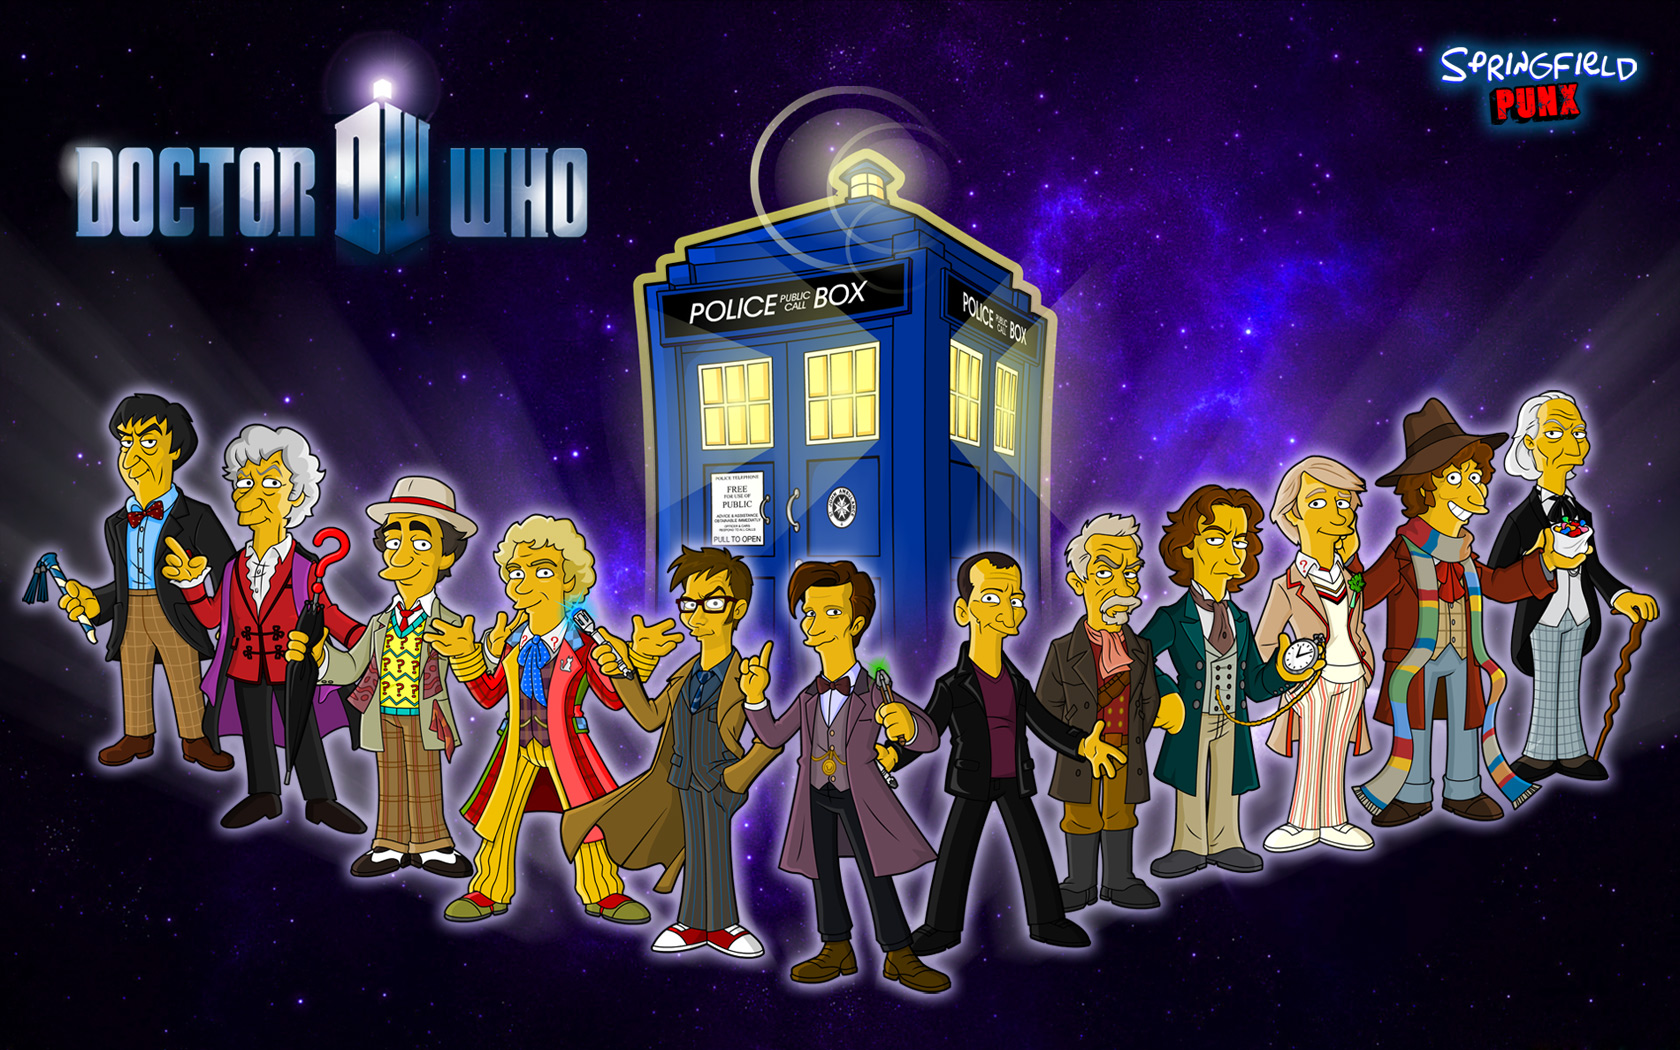 Doctor Who Desktop Wallpaper Windows Doctor Who Wallpapers Windows 1680x1050